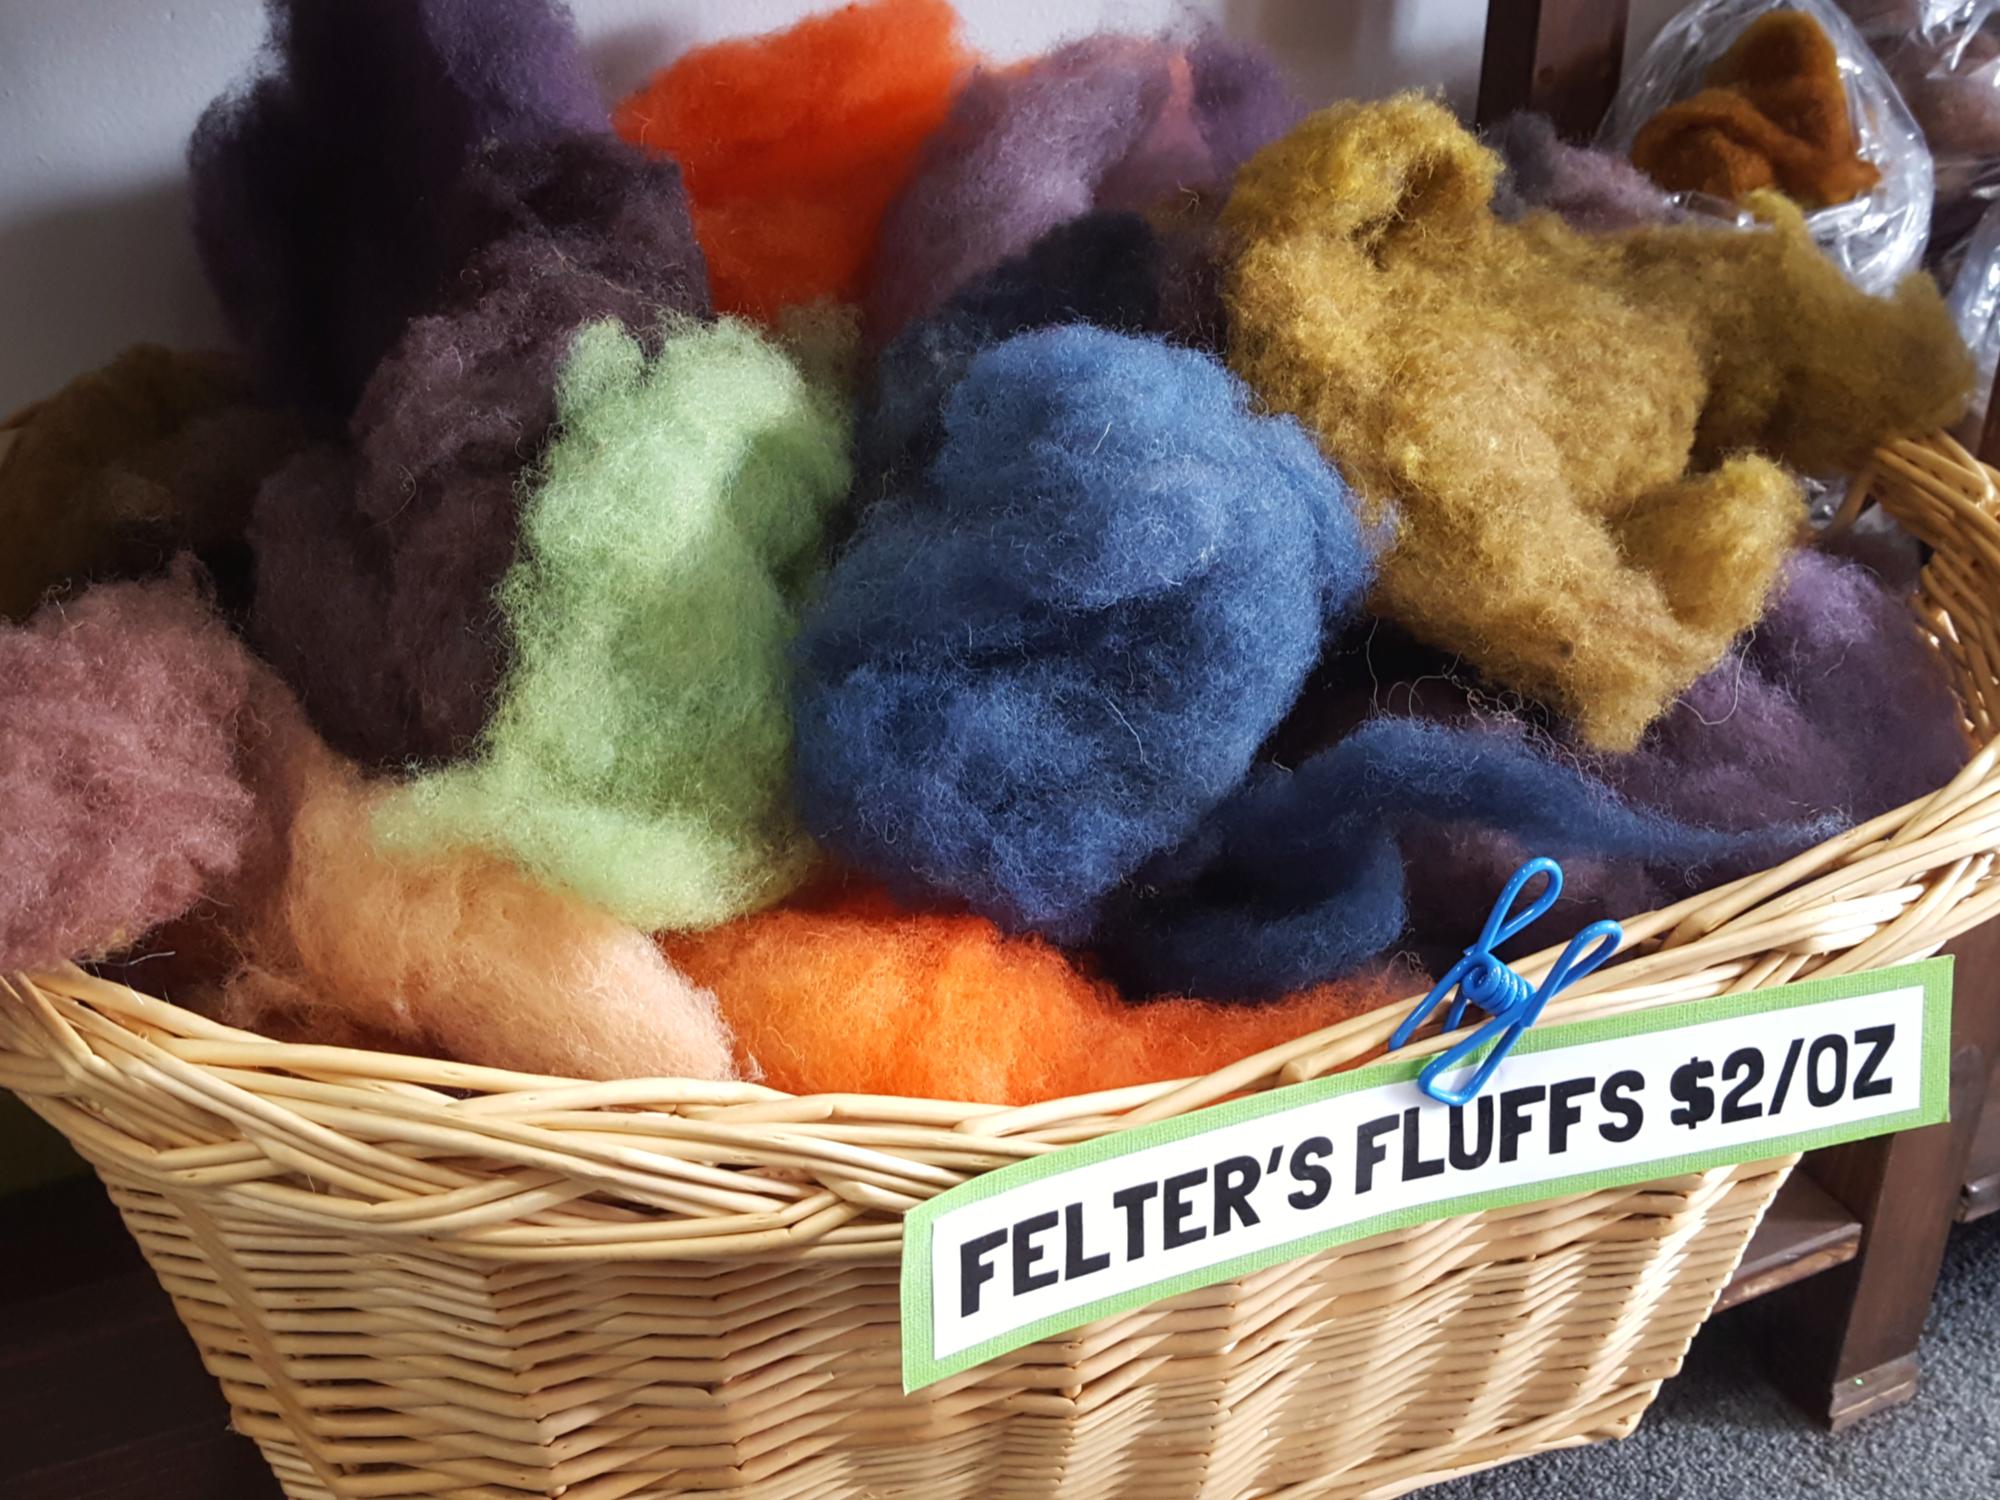 Felters Fluffs, 2oz